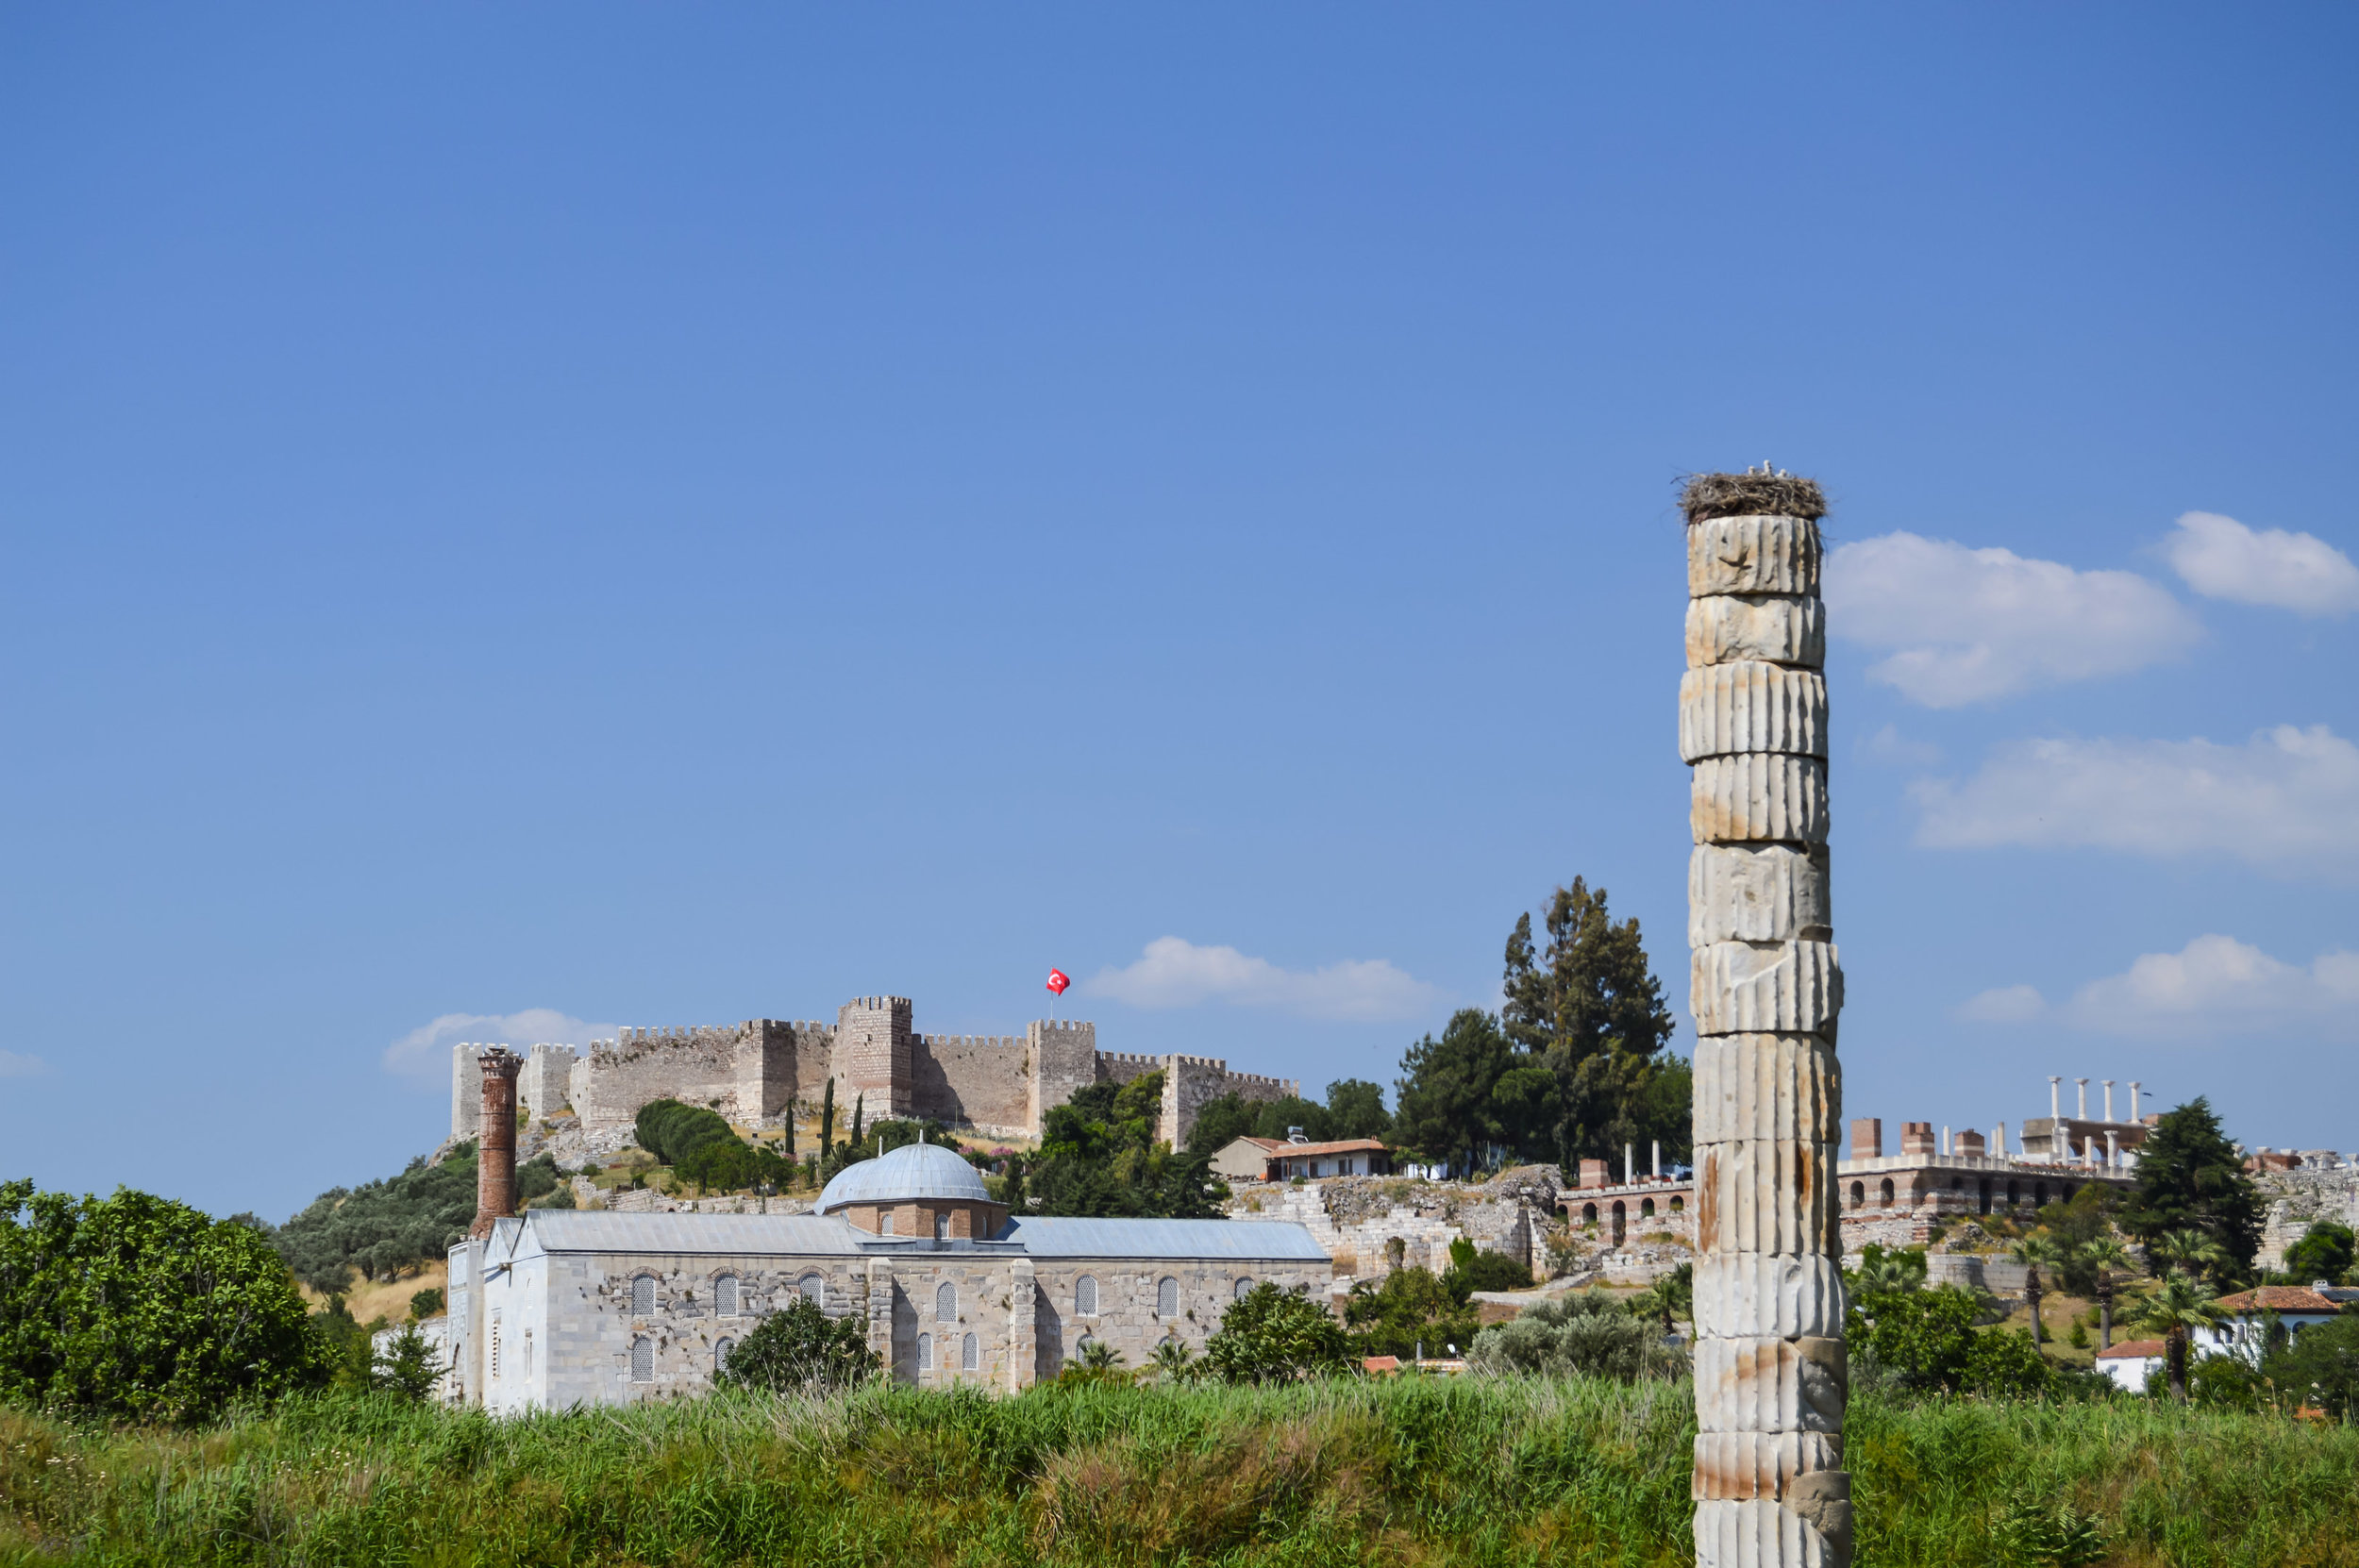 Roman Architecture Temple of Artemis City of Ephesus Blue Sky Turkey